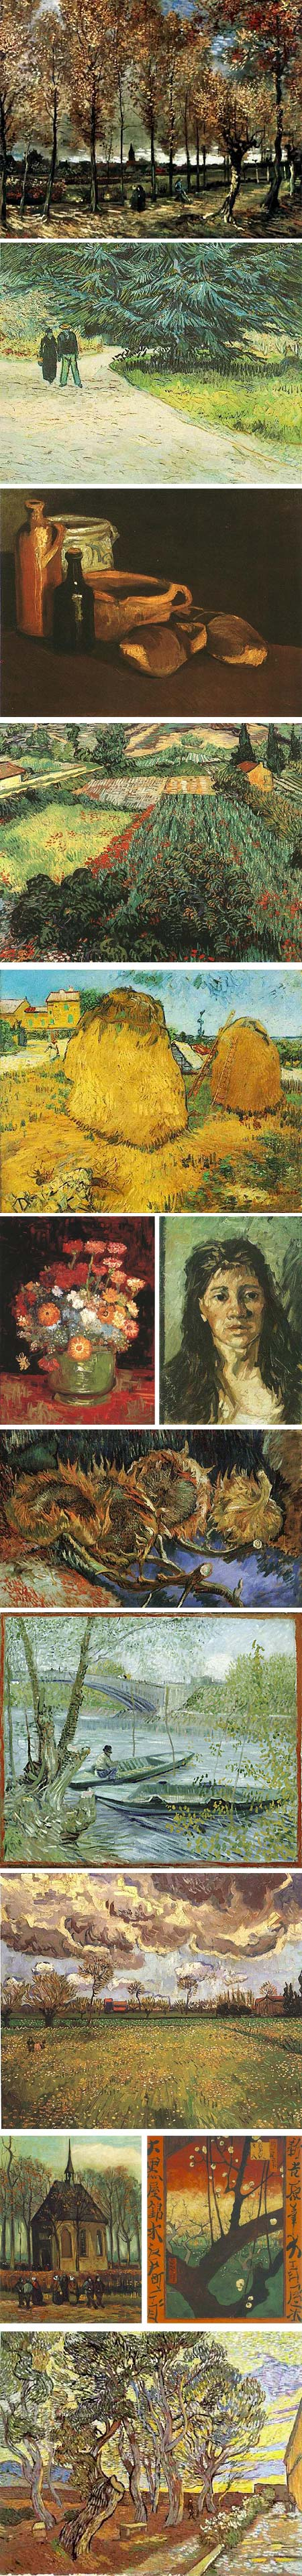 lesser know works by Van Gogh